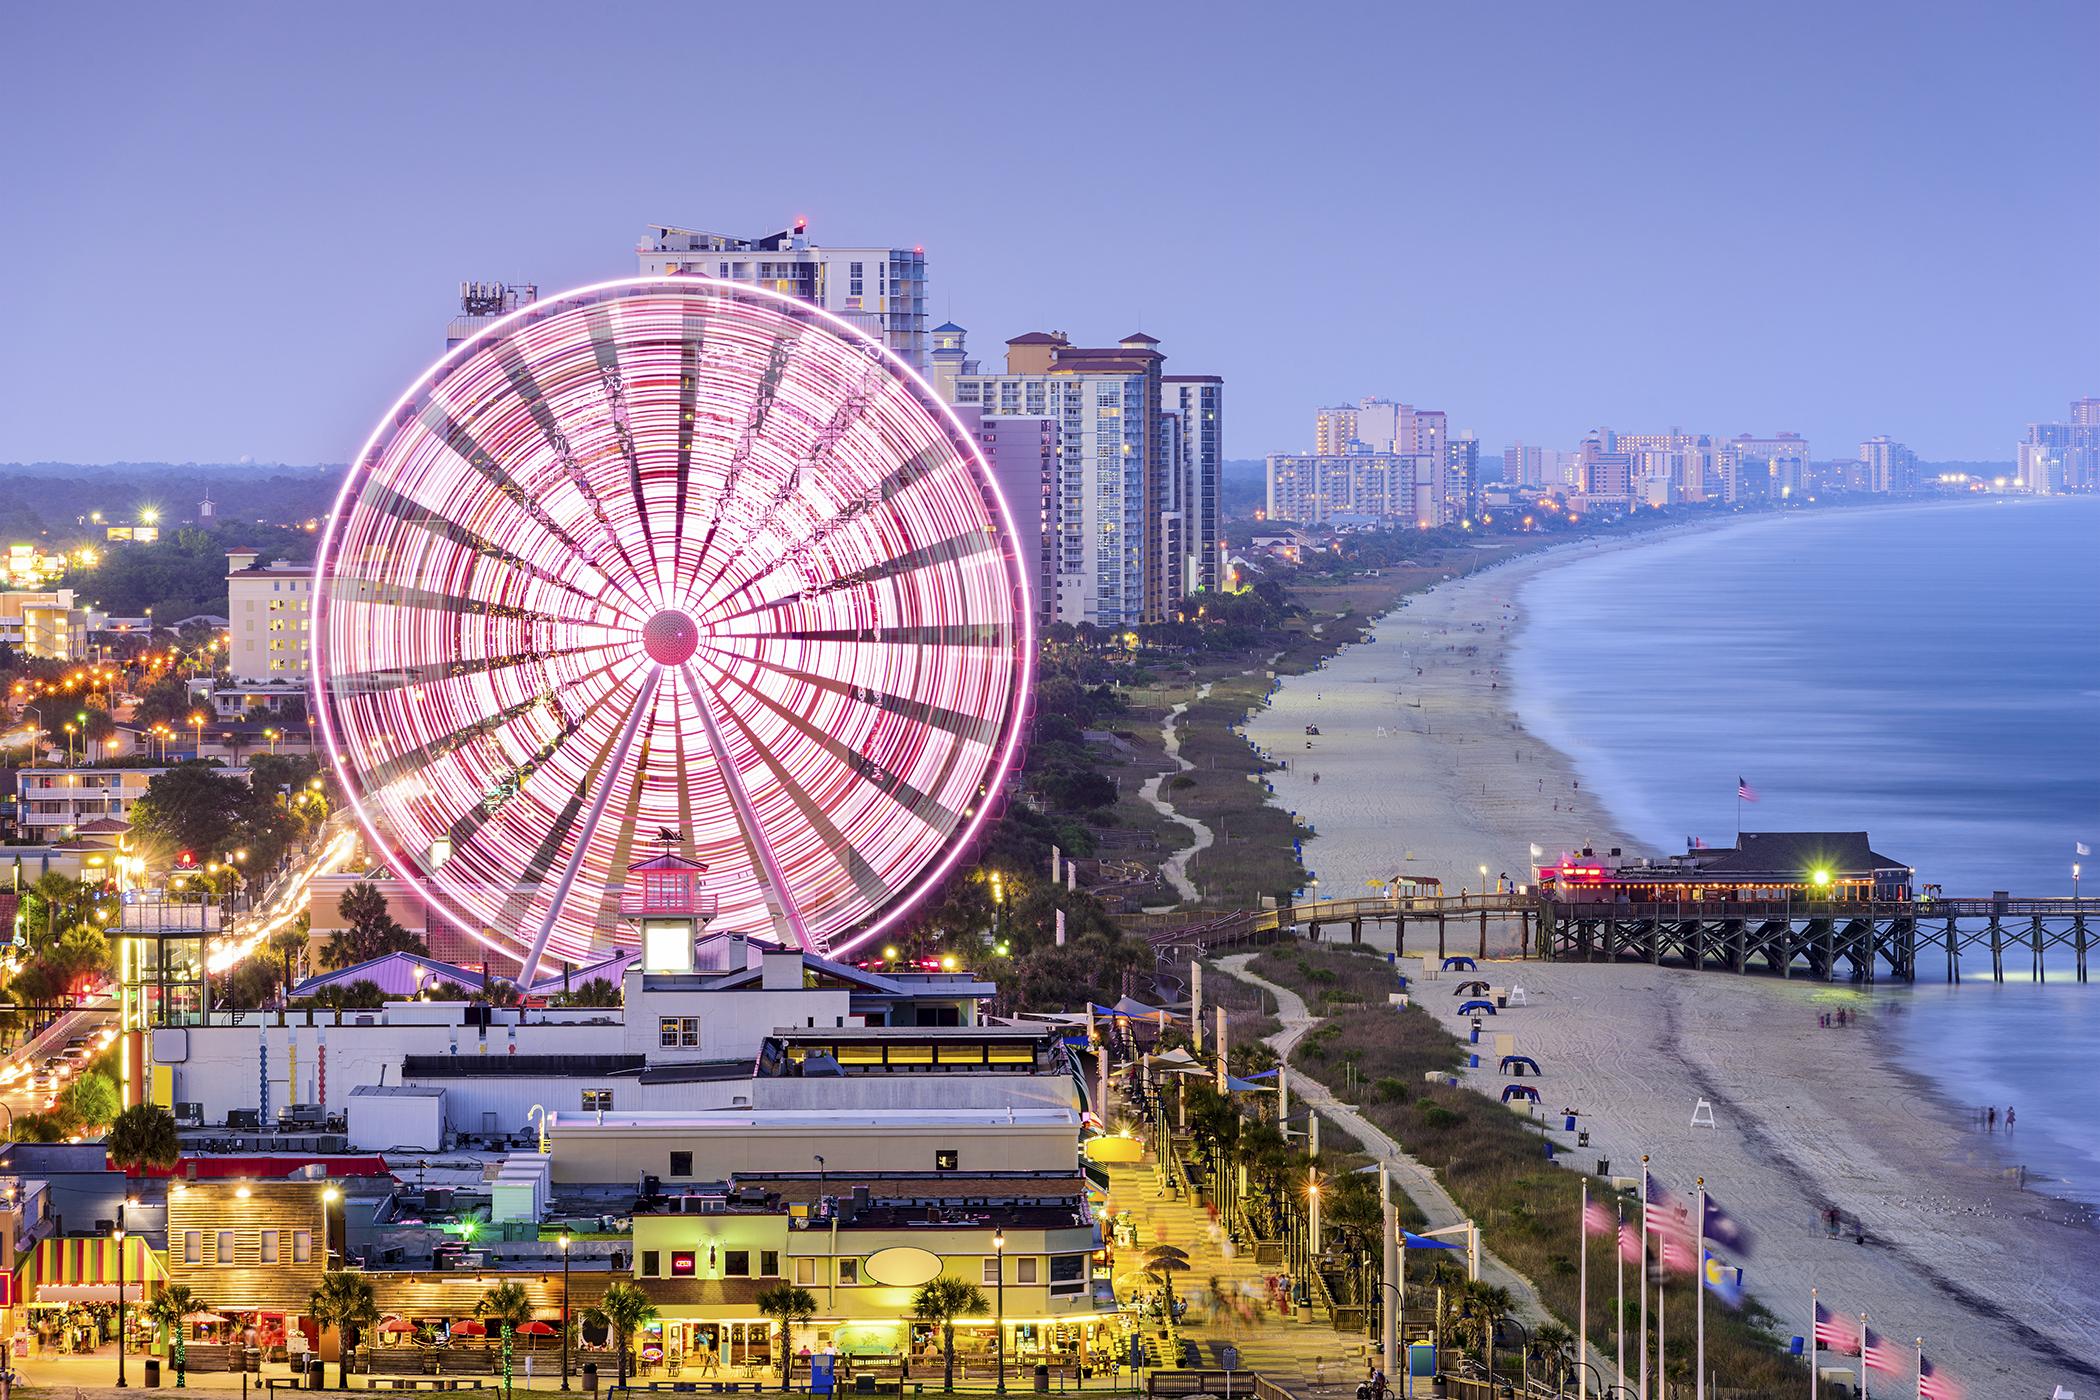 170316-travel-best-beaches-myrtle-beach-south-carolina